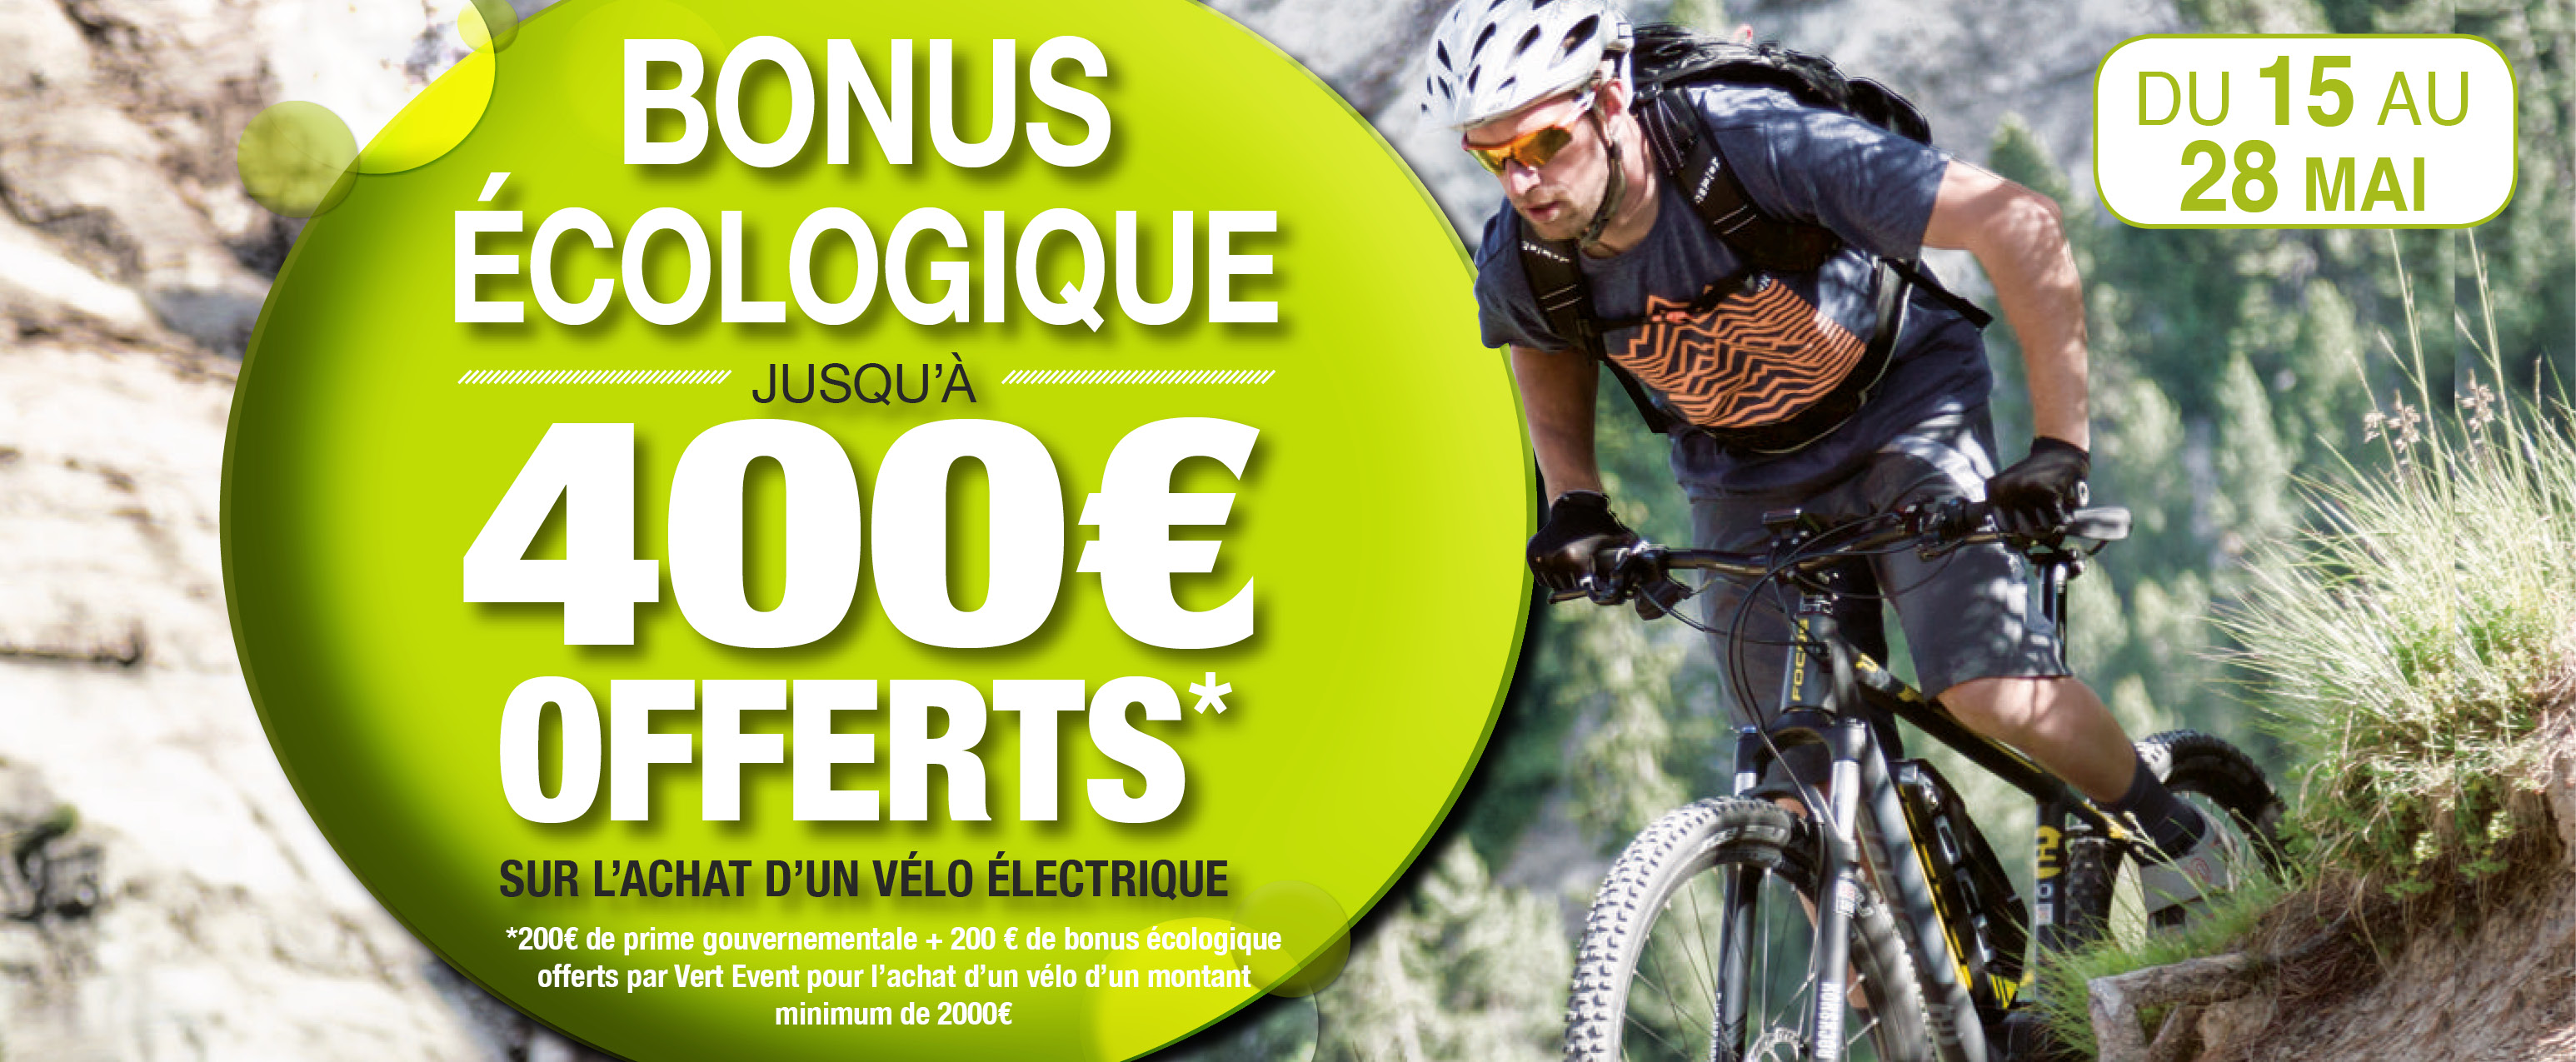 Bonus Eco doublé en mai